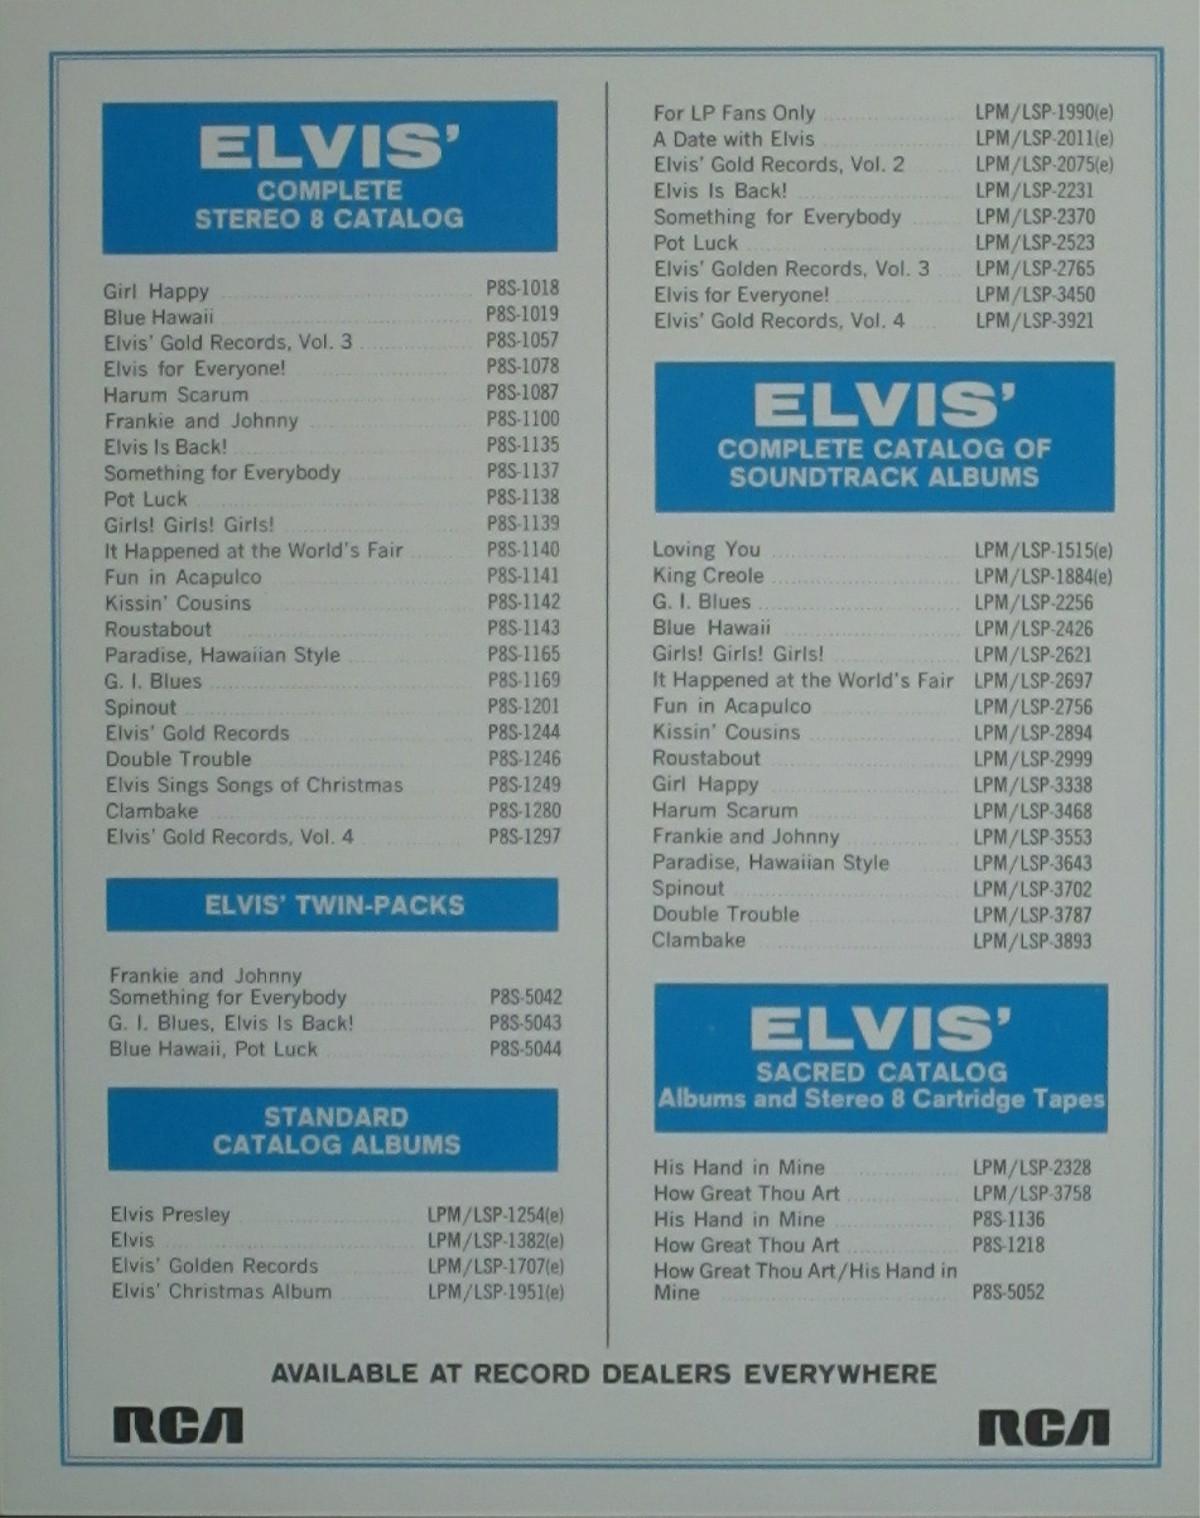 ELVIS' GOLD RECORDS VOL 4 Bonus-egr4bxjzrv